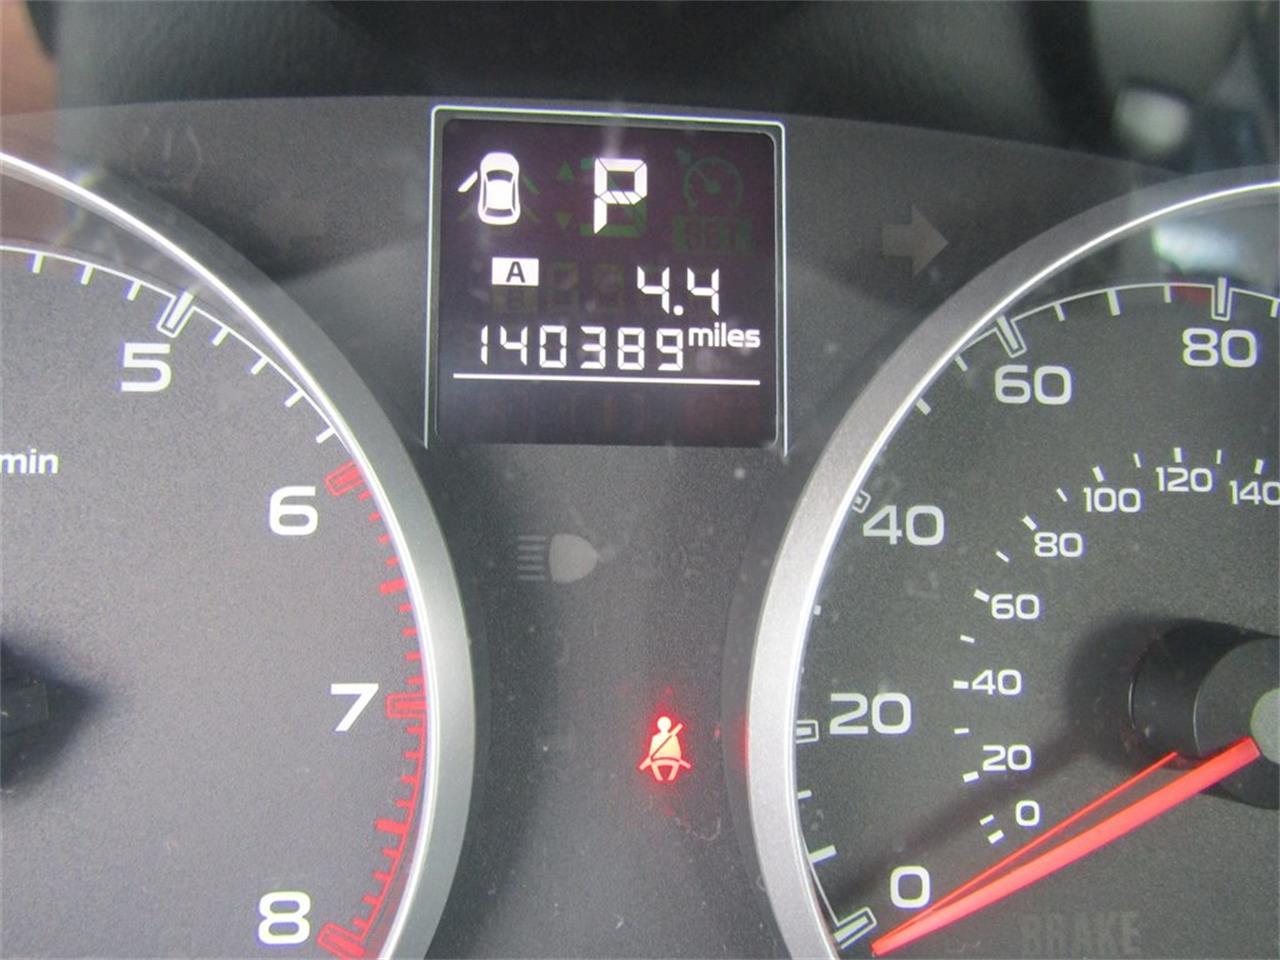 2013 Subaru Legacy (CC-1272023) for sale in Orlando, Florida